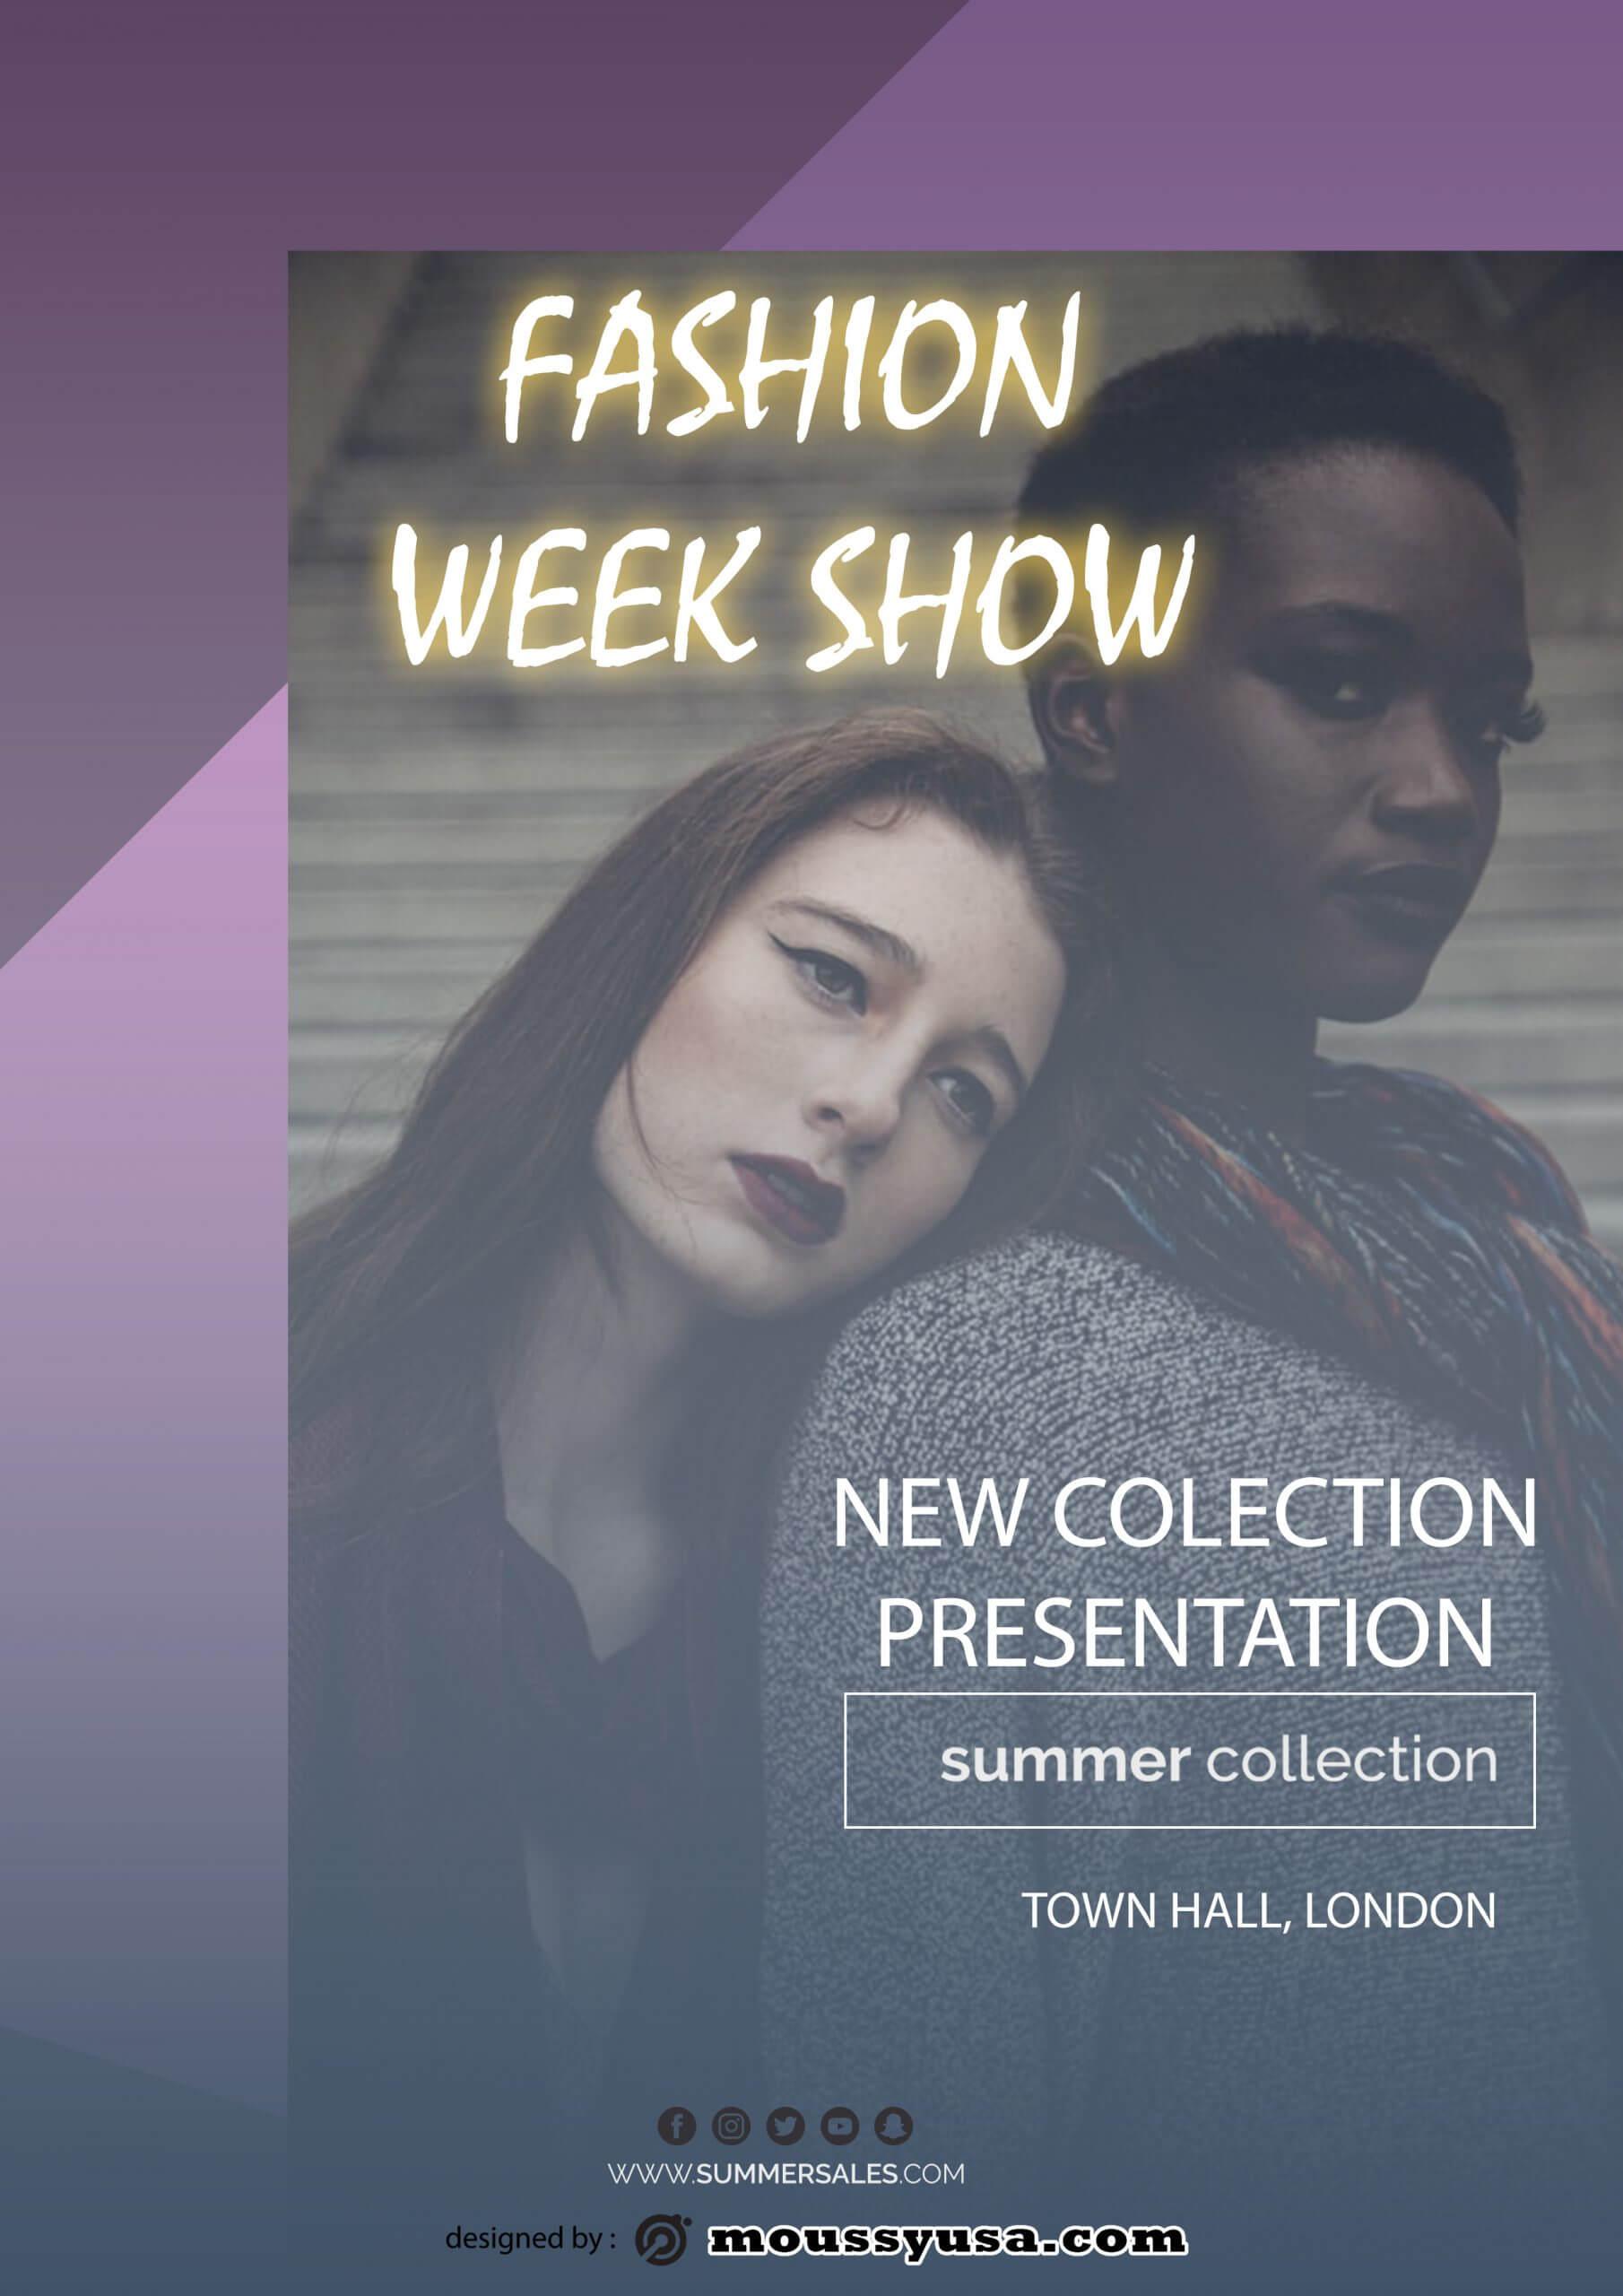 fashion week show flyer template design